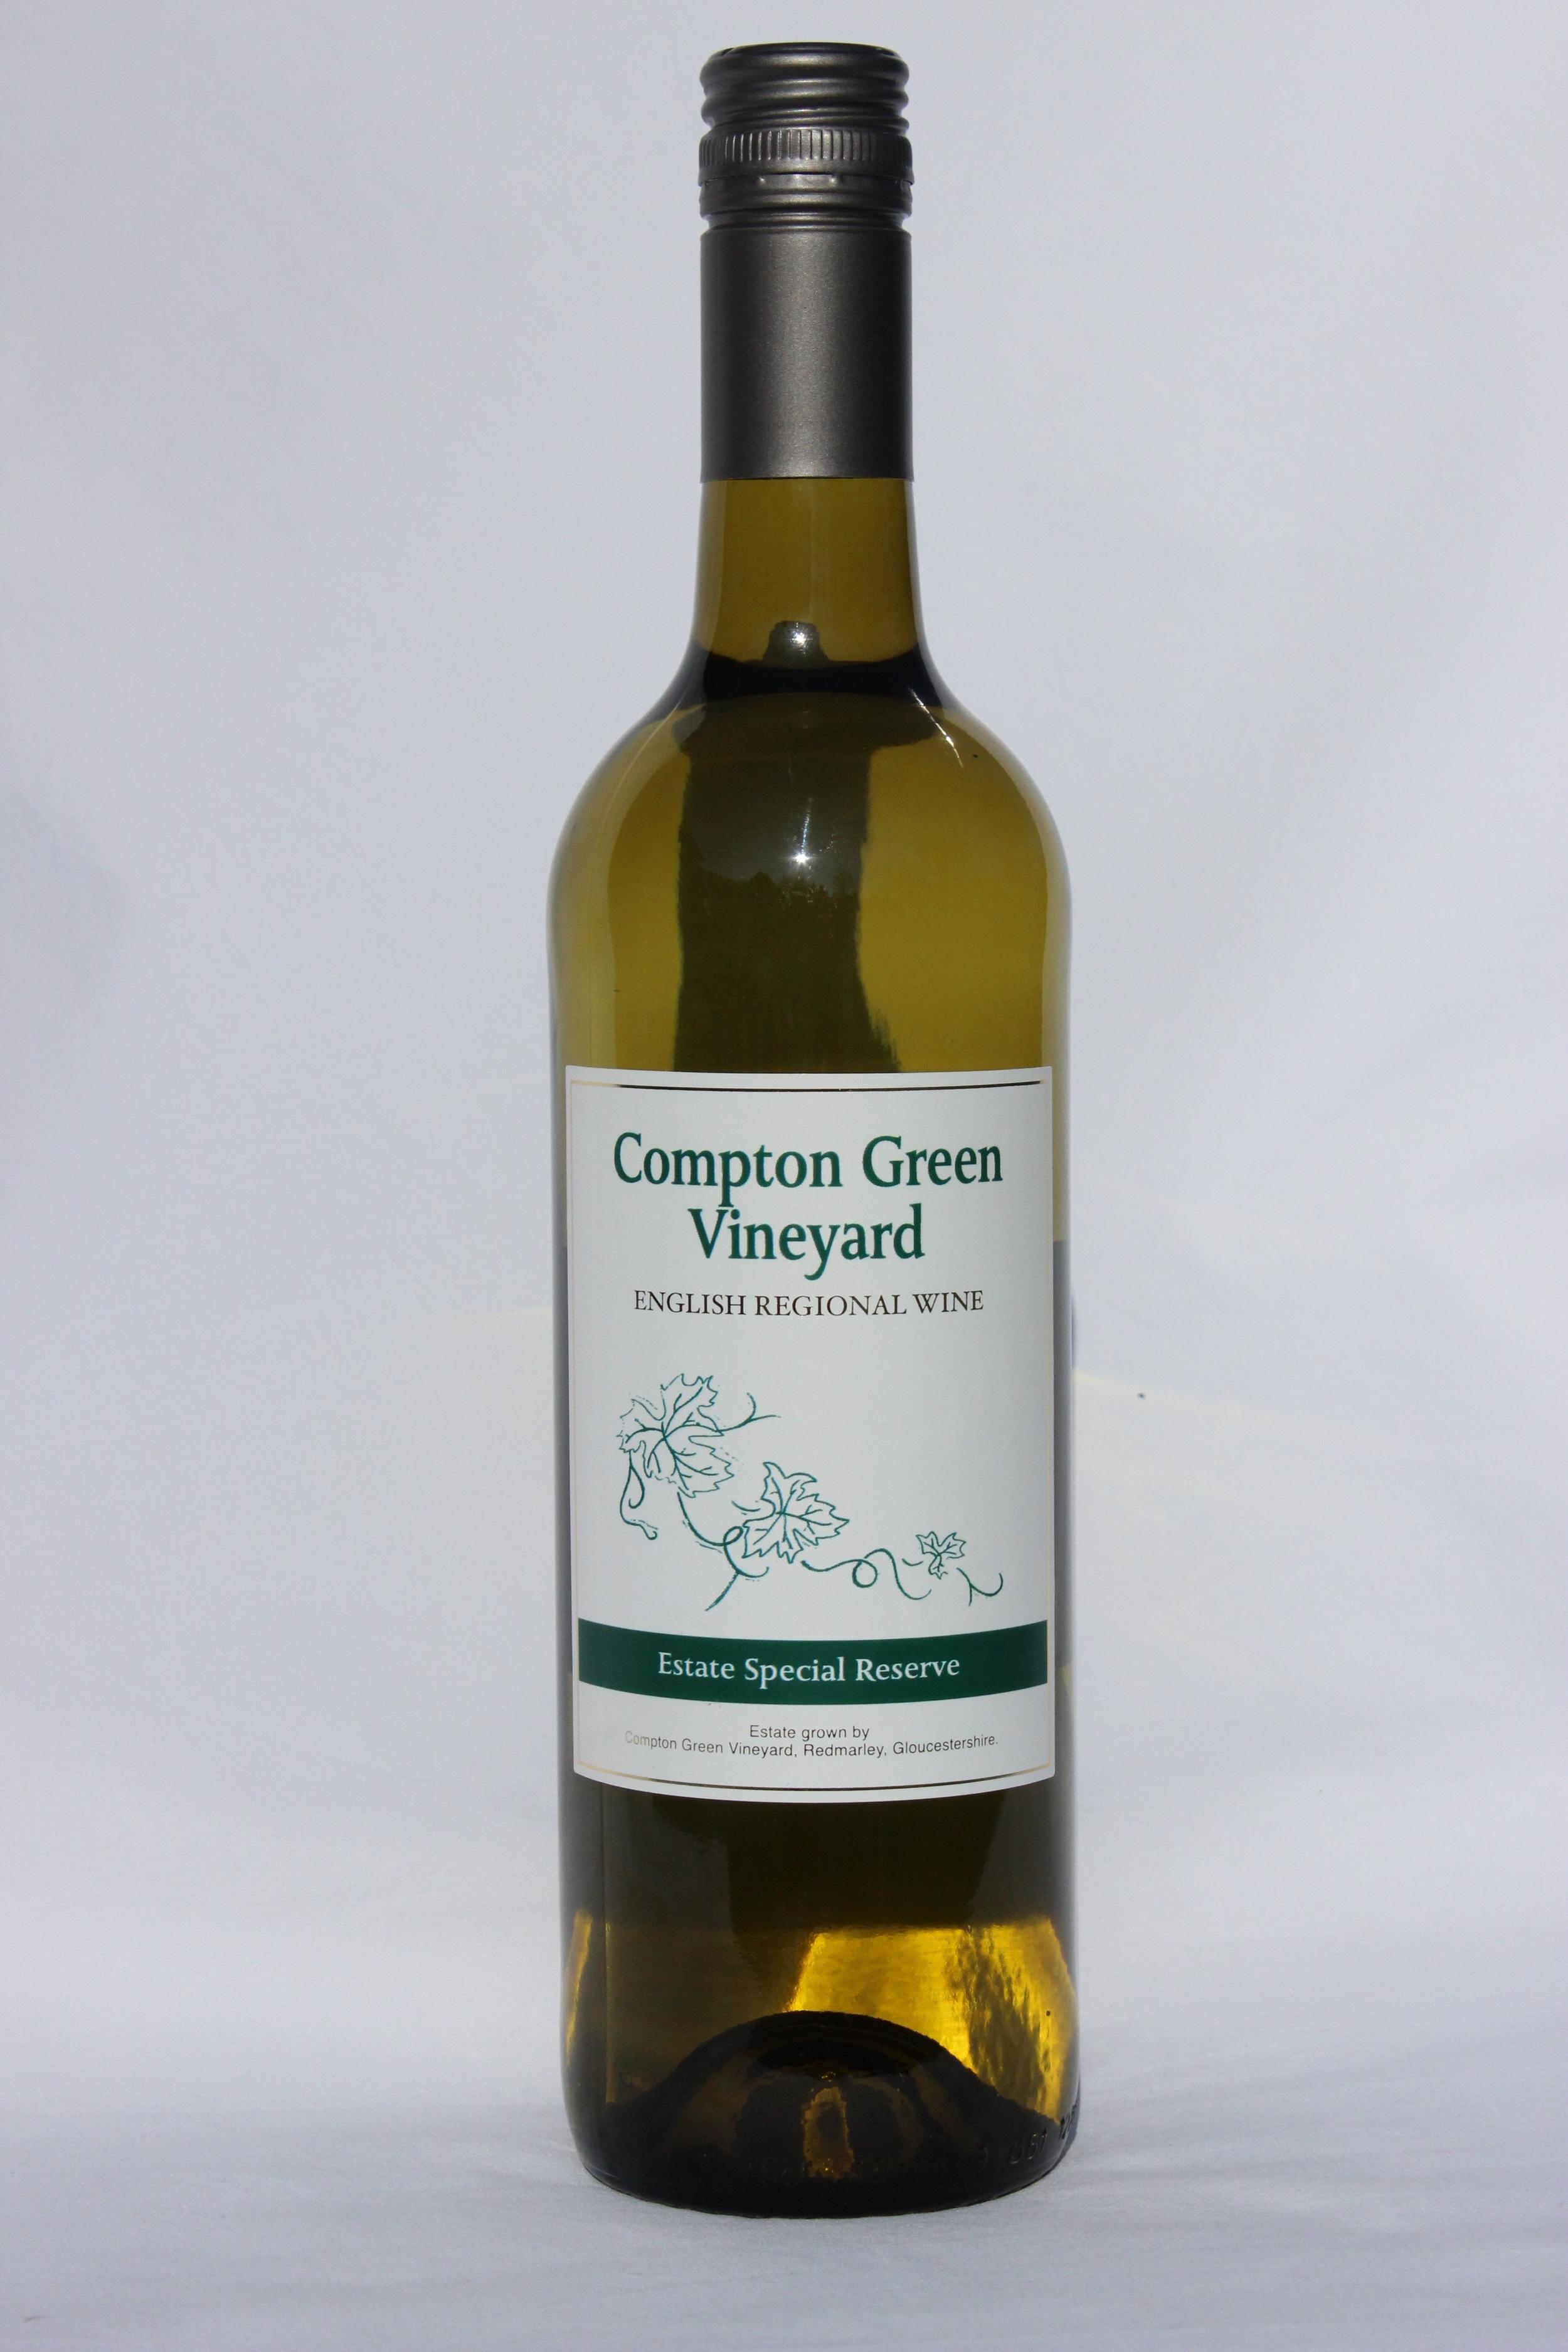 COMPTON GREEN VINEYARD